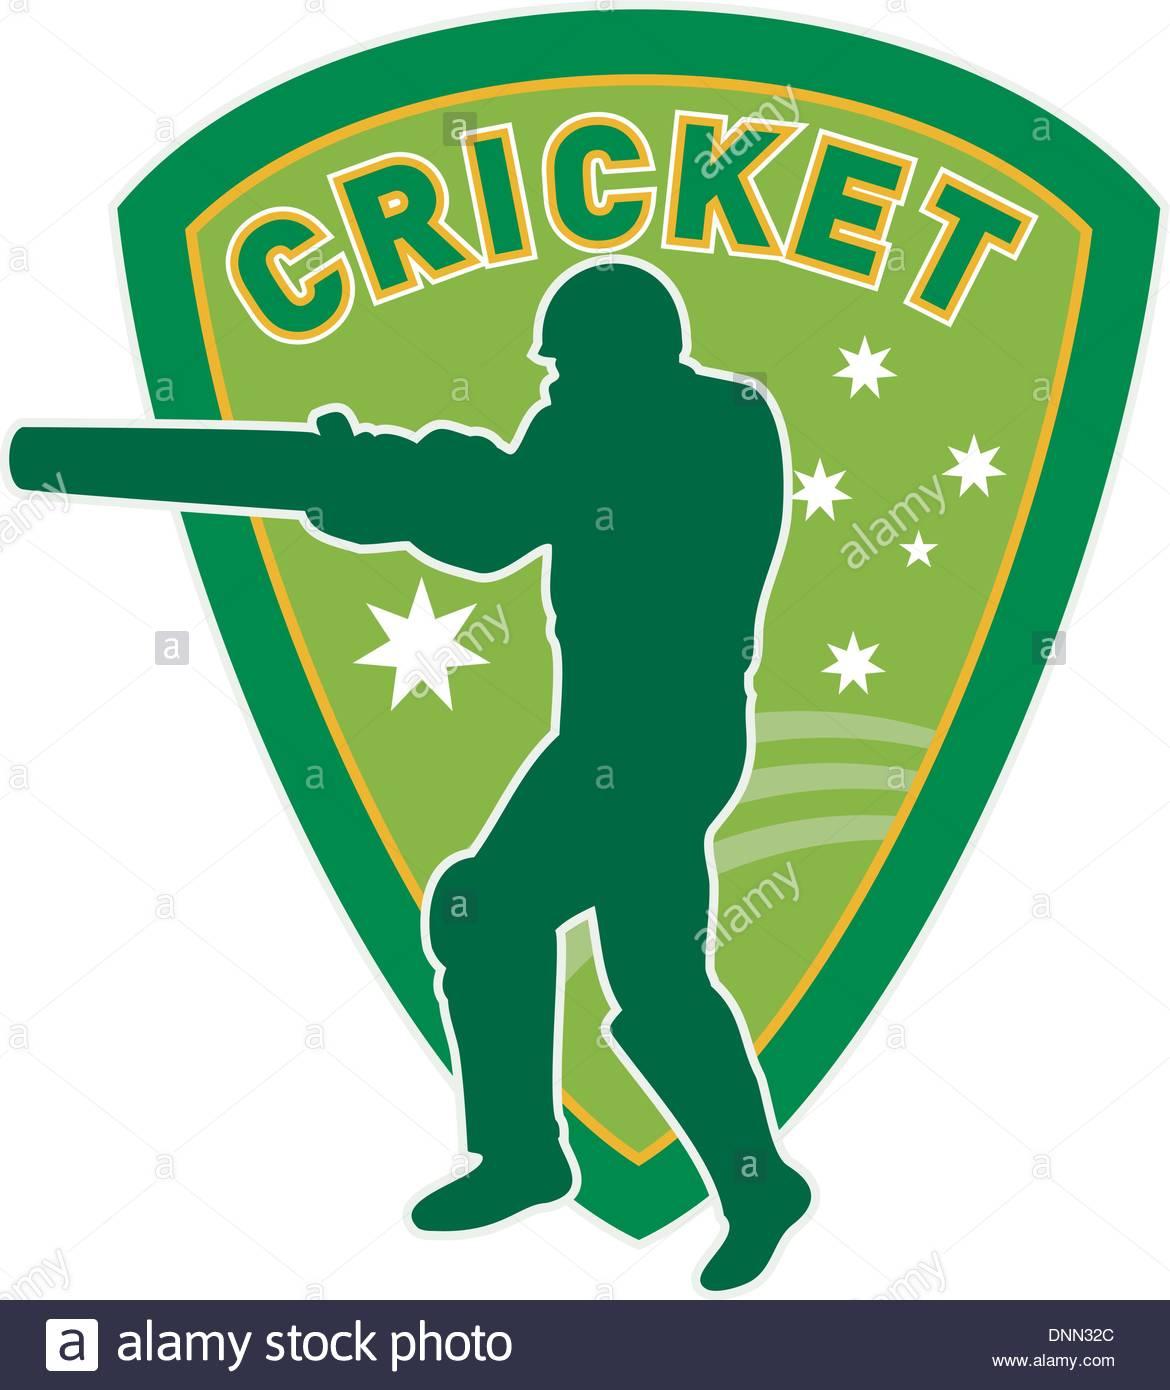 1170x1390 Illustration Of A Cricket Sports Player Batsman Silhouette Batting